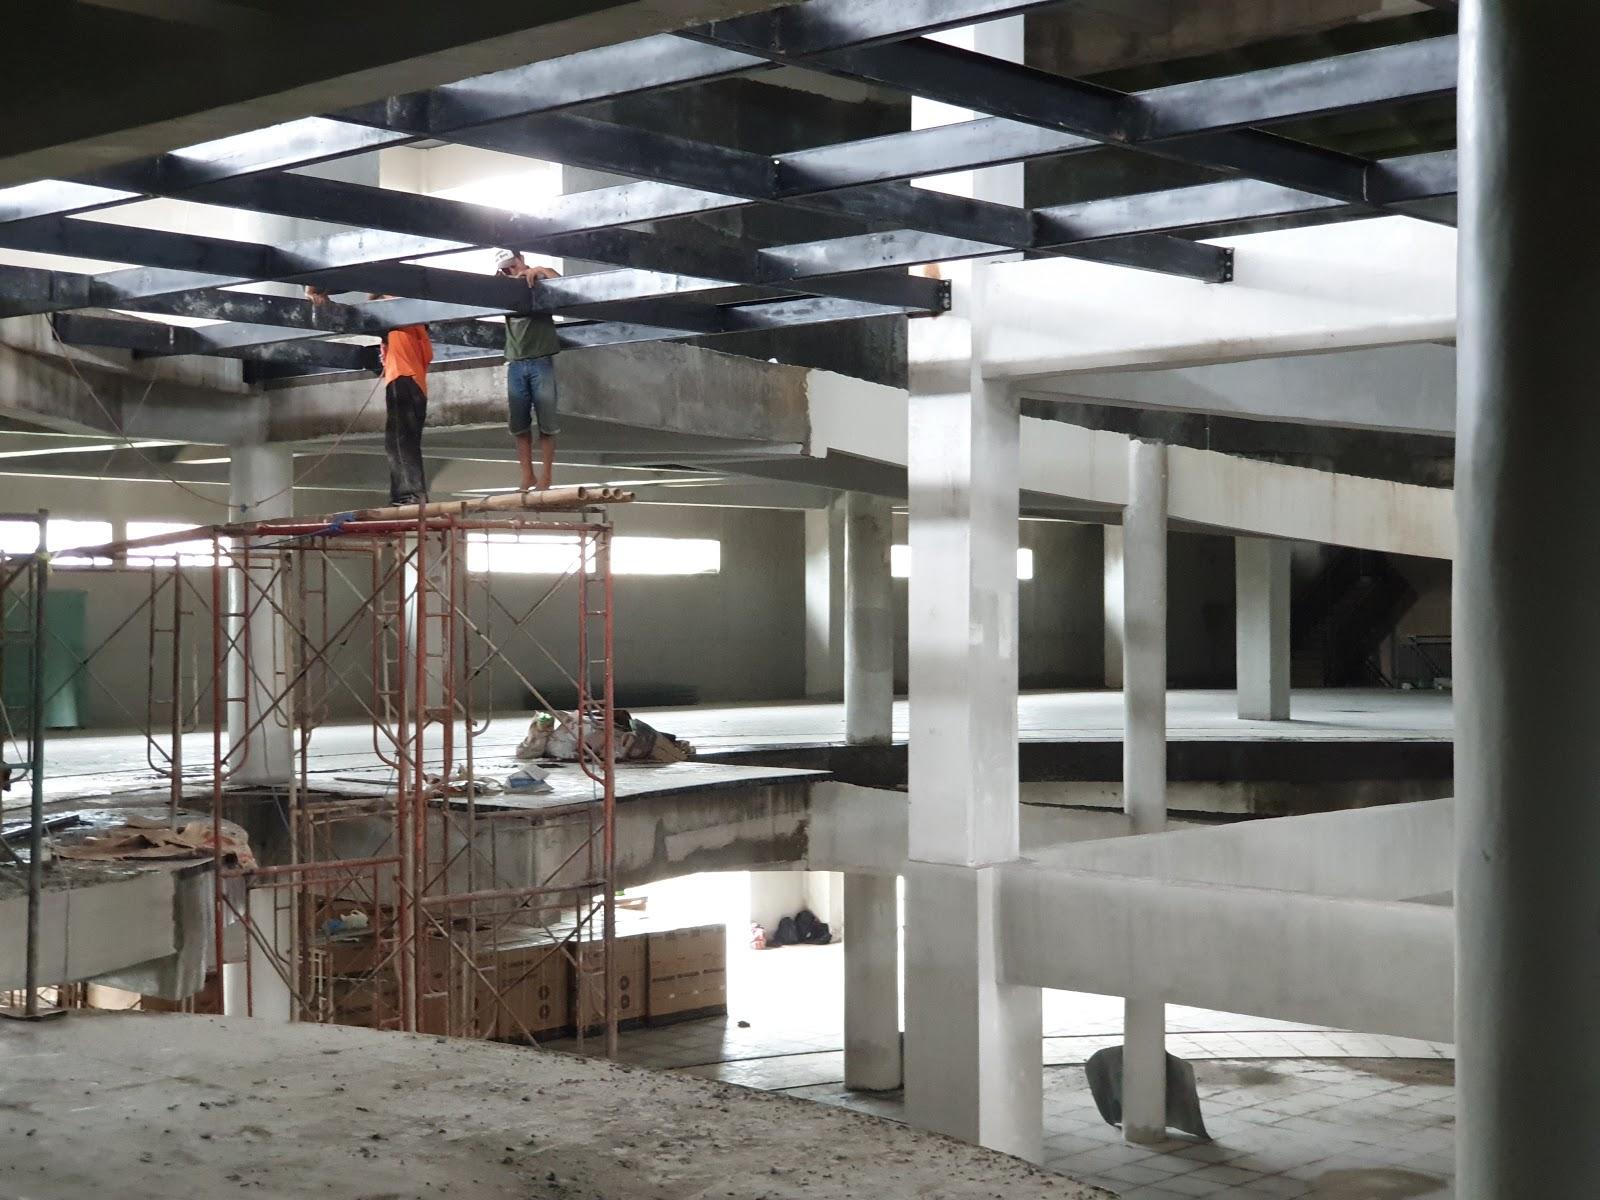 harga atap baja ringan lapis pasir berat bali wf, iwf , h-beam, konstruksi lengkung ...